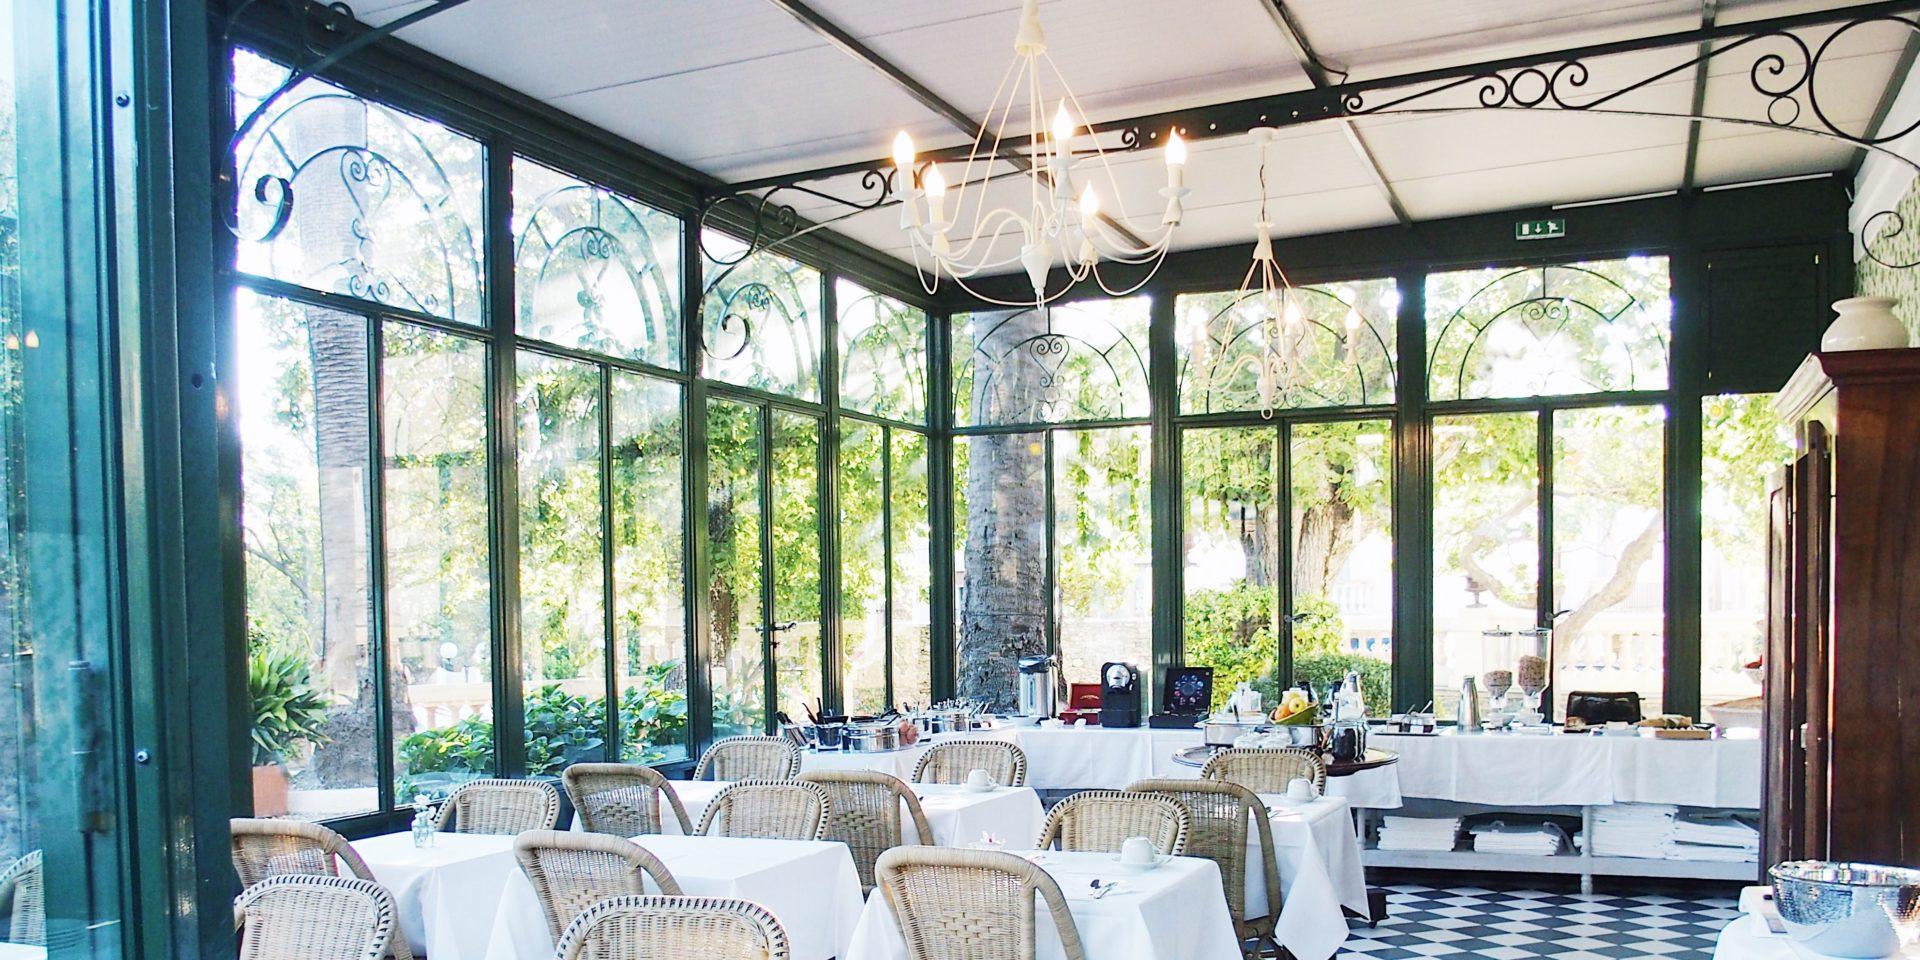 Hotel-Castel-Brando-Erbalunga-Cap-Corse-Corsica-Frankrijk-ontbijtruimte-serre-zwart-wit-tegelvloer